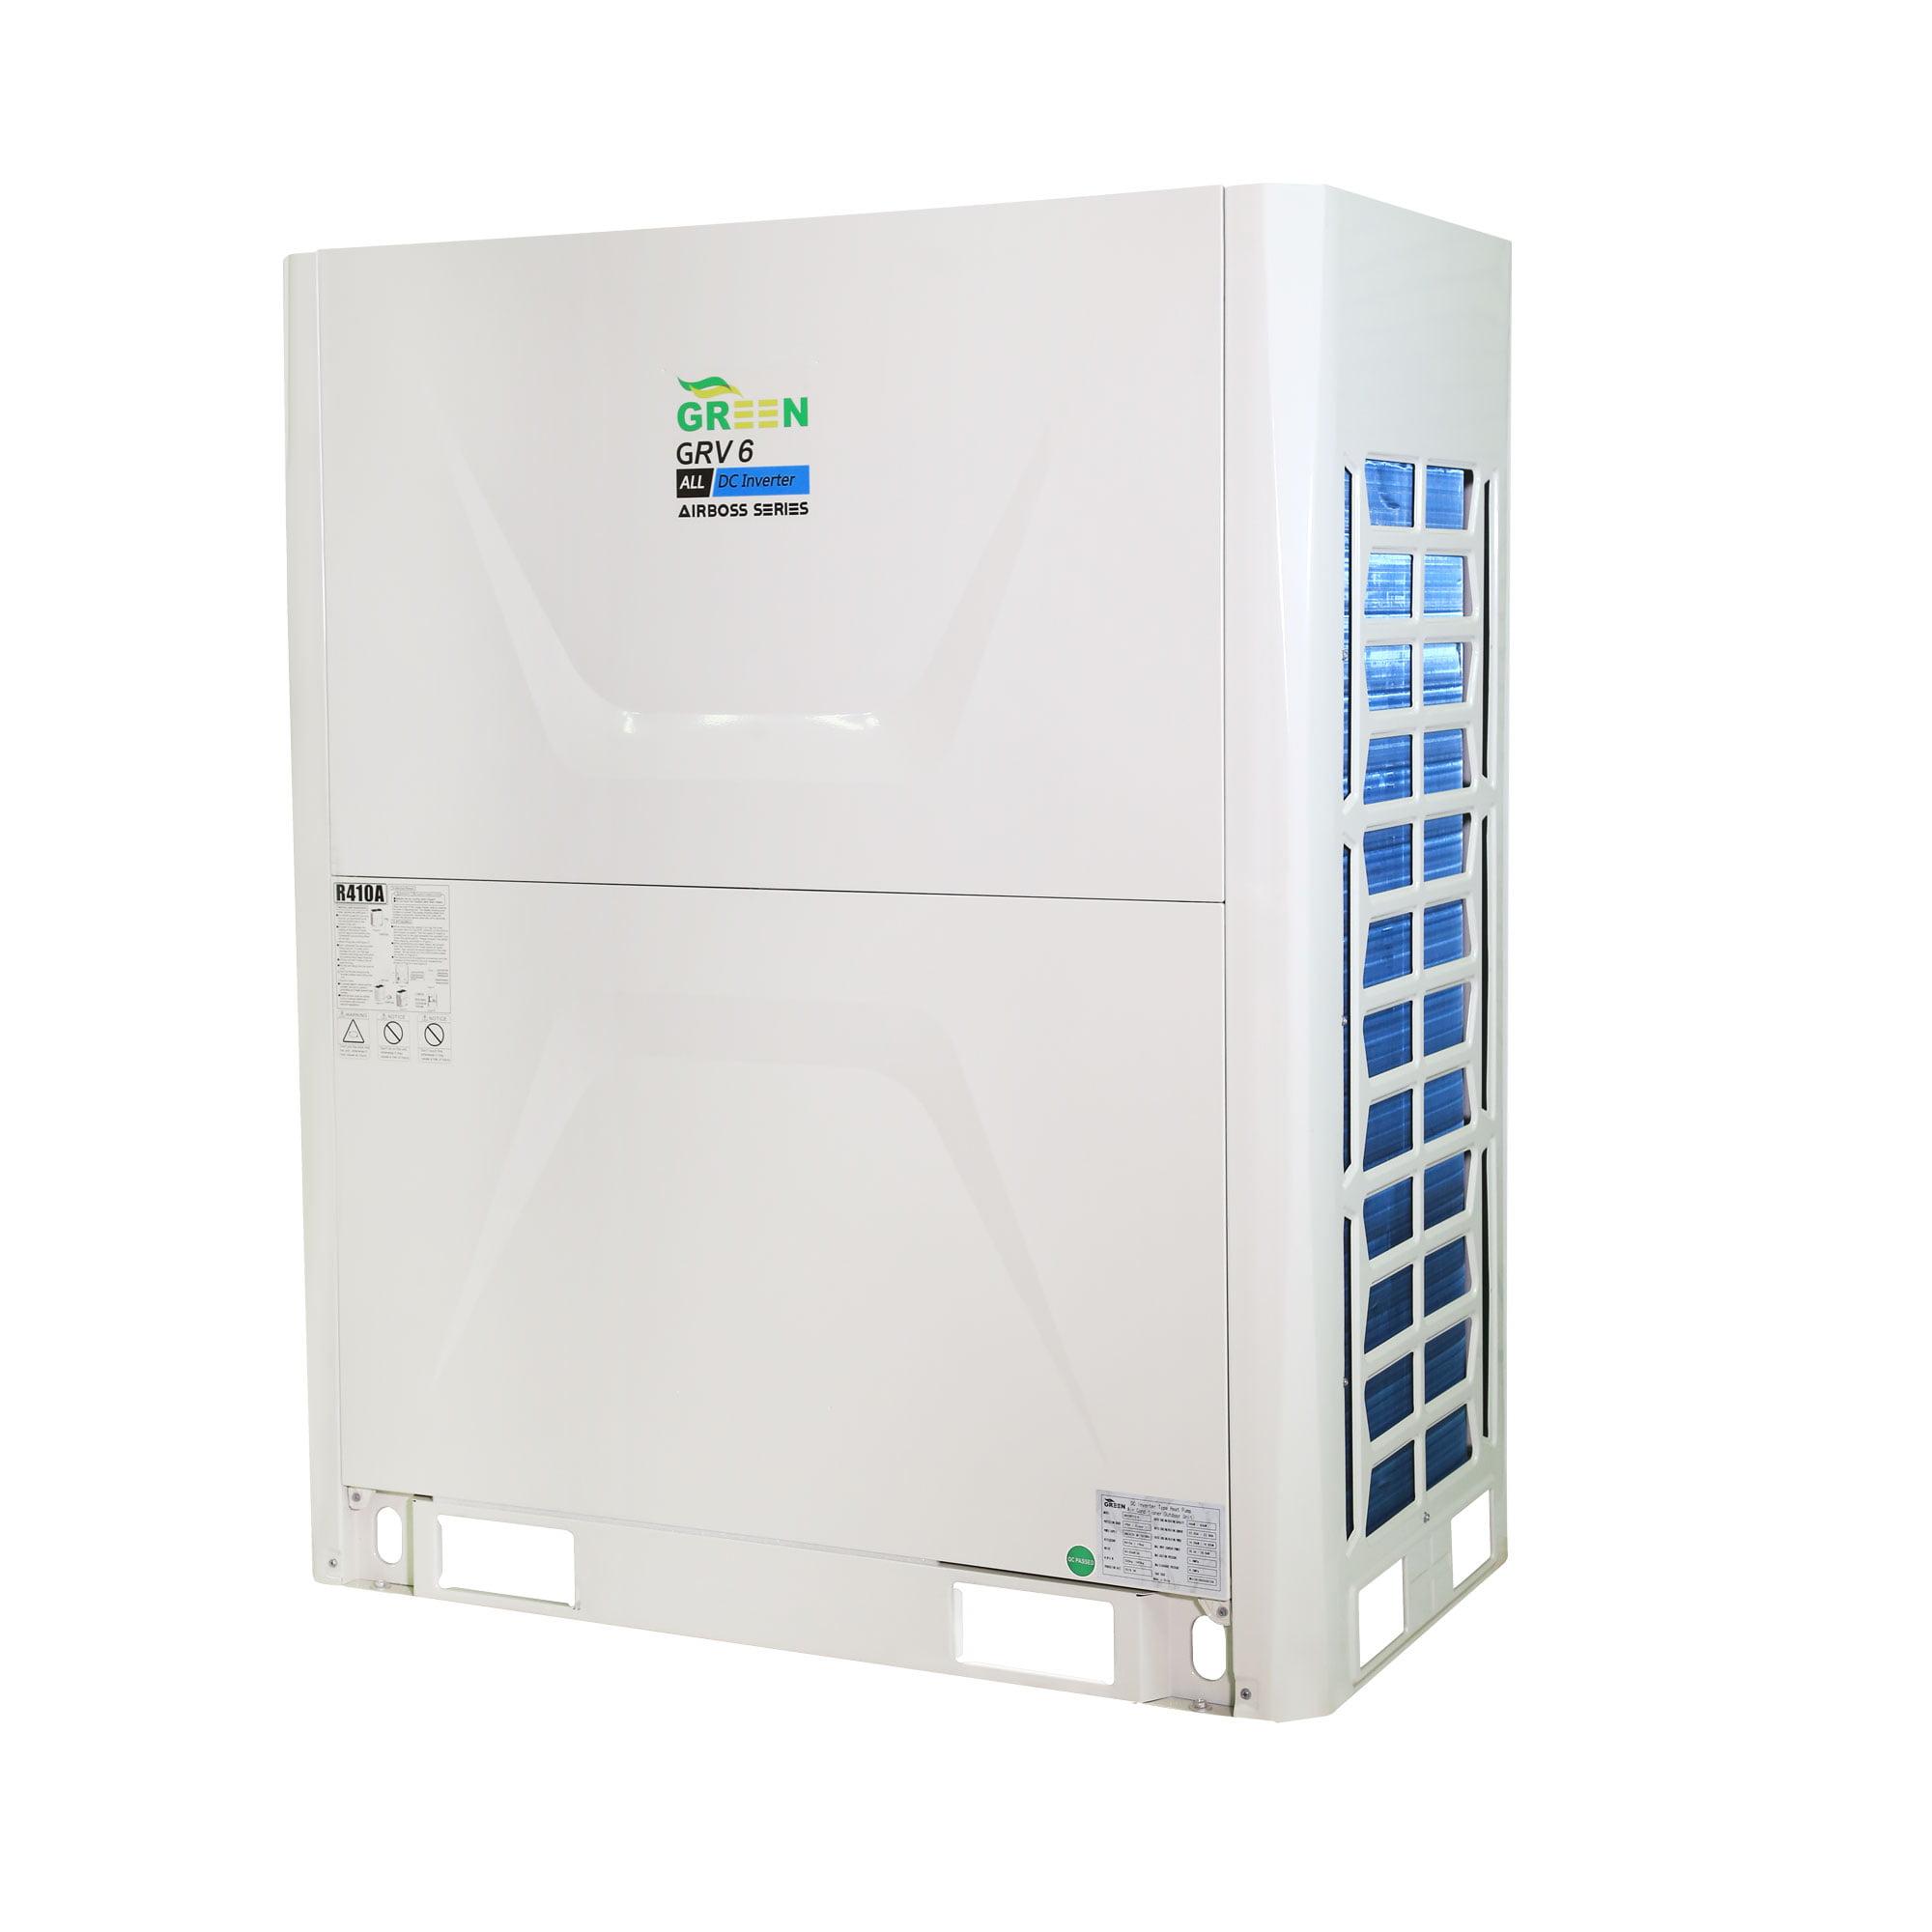 VRF outdoor uniti GRV greenac high VRF سیستم VRF گرین - GRV